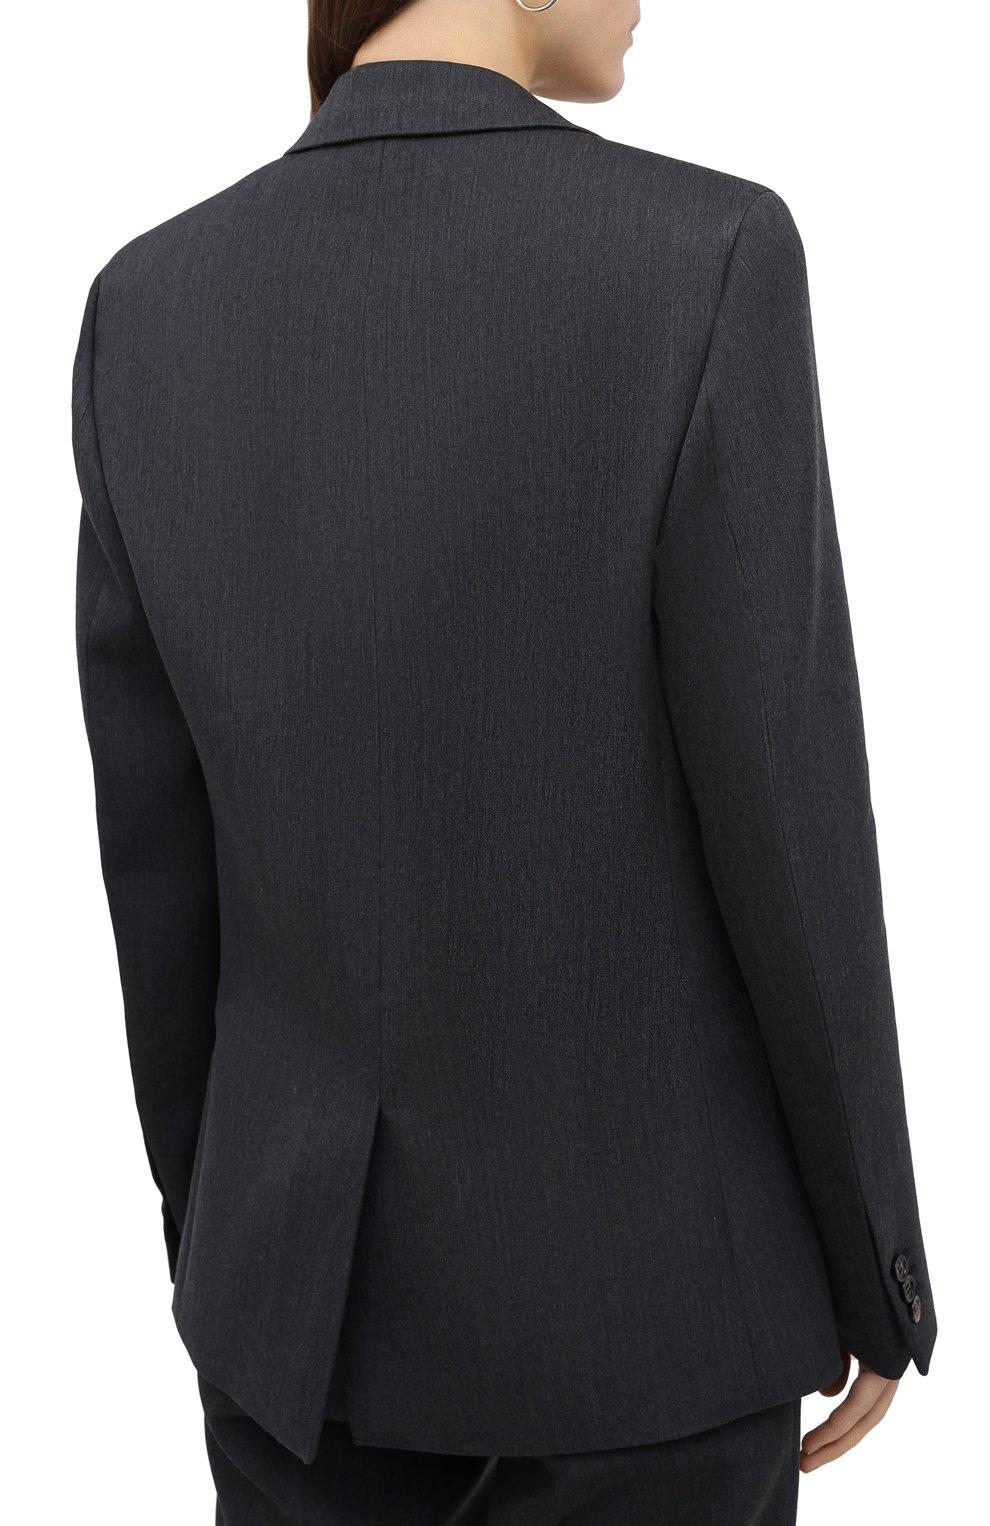 Женский шерстяной жакет BOTTEGA VENETA темно-серого цвета, арт. 628721/VKIV0 | Фото 4